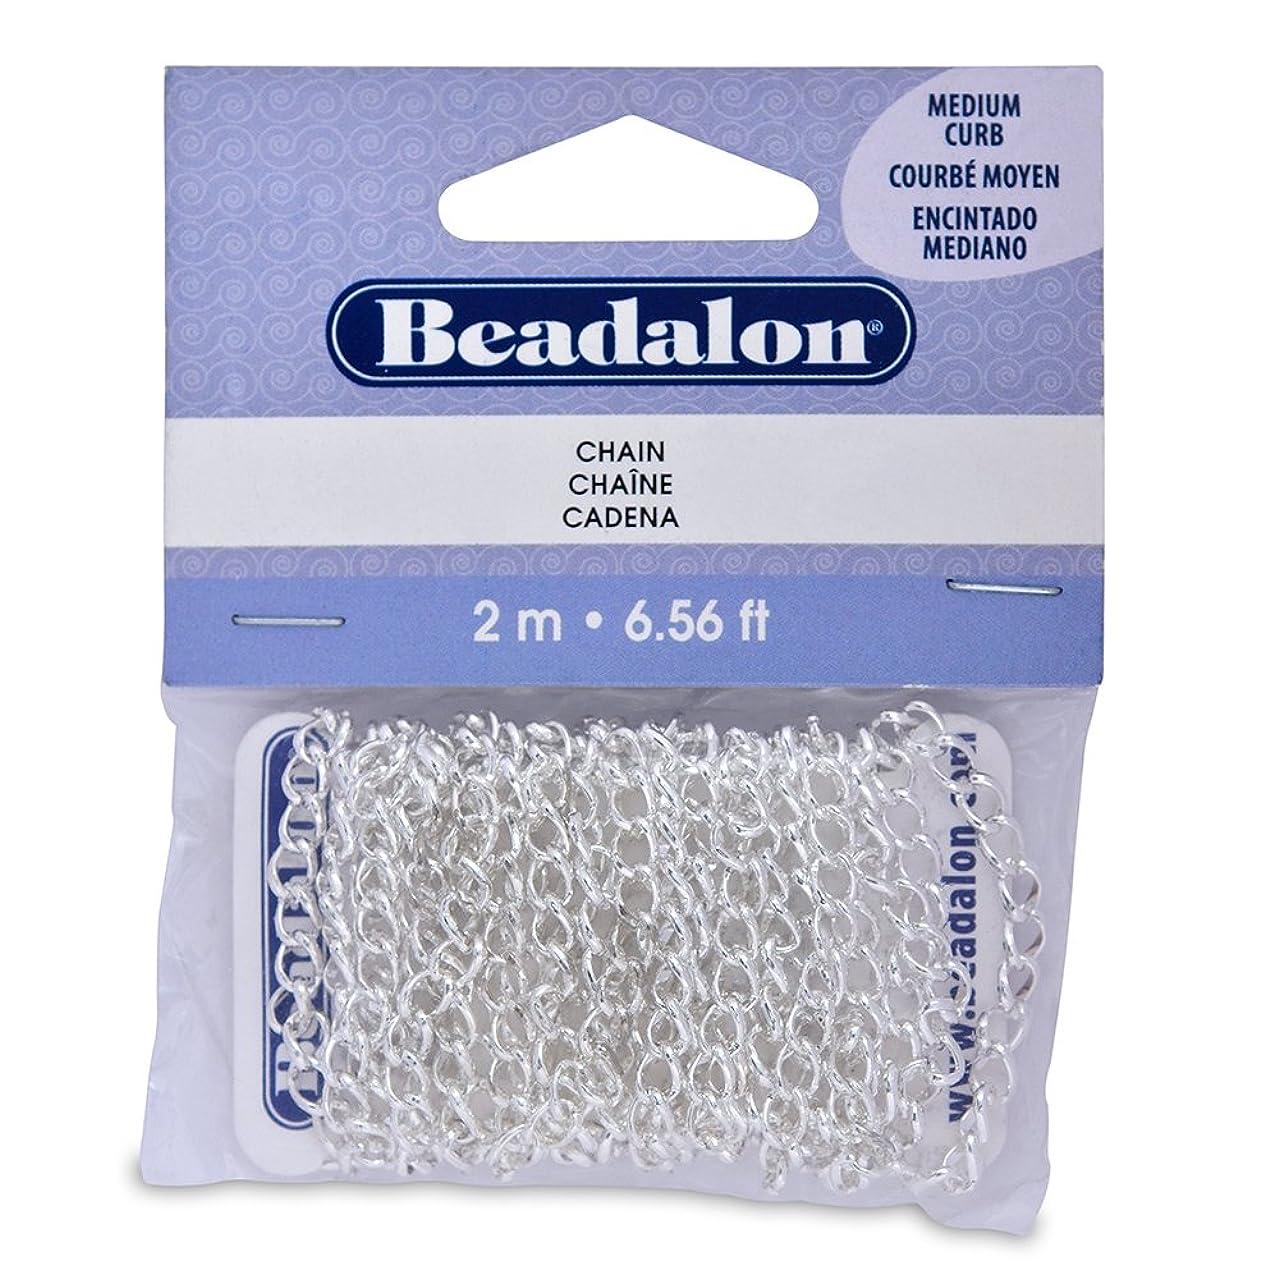 Artistic Wire Beadalon Chain 4.1-Inch Medium Curb Silver Plated, 2-Meters